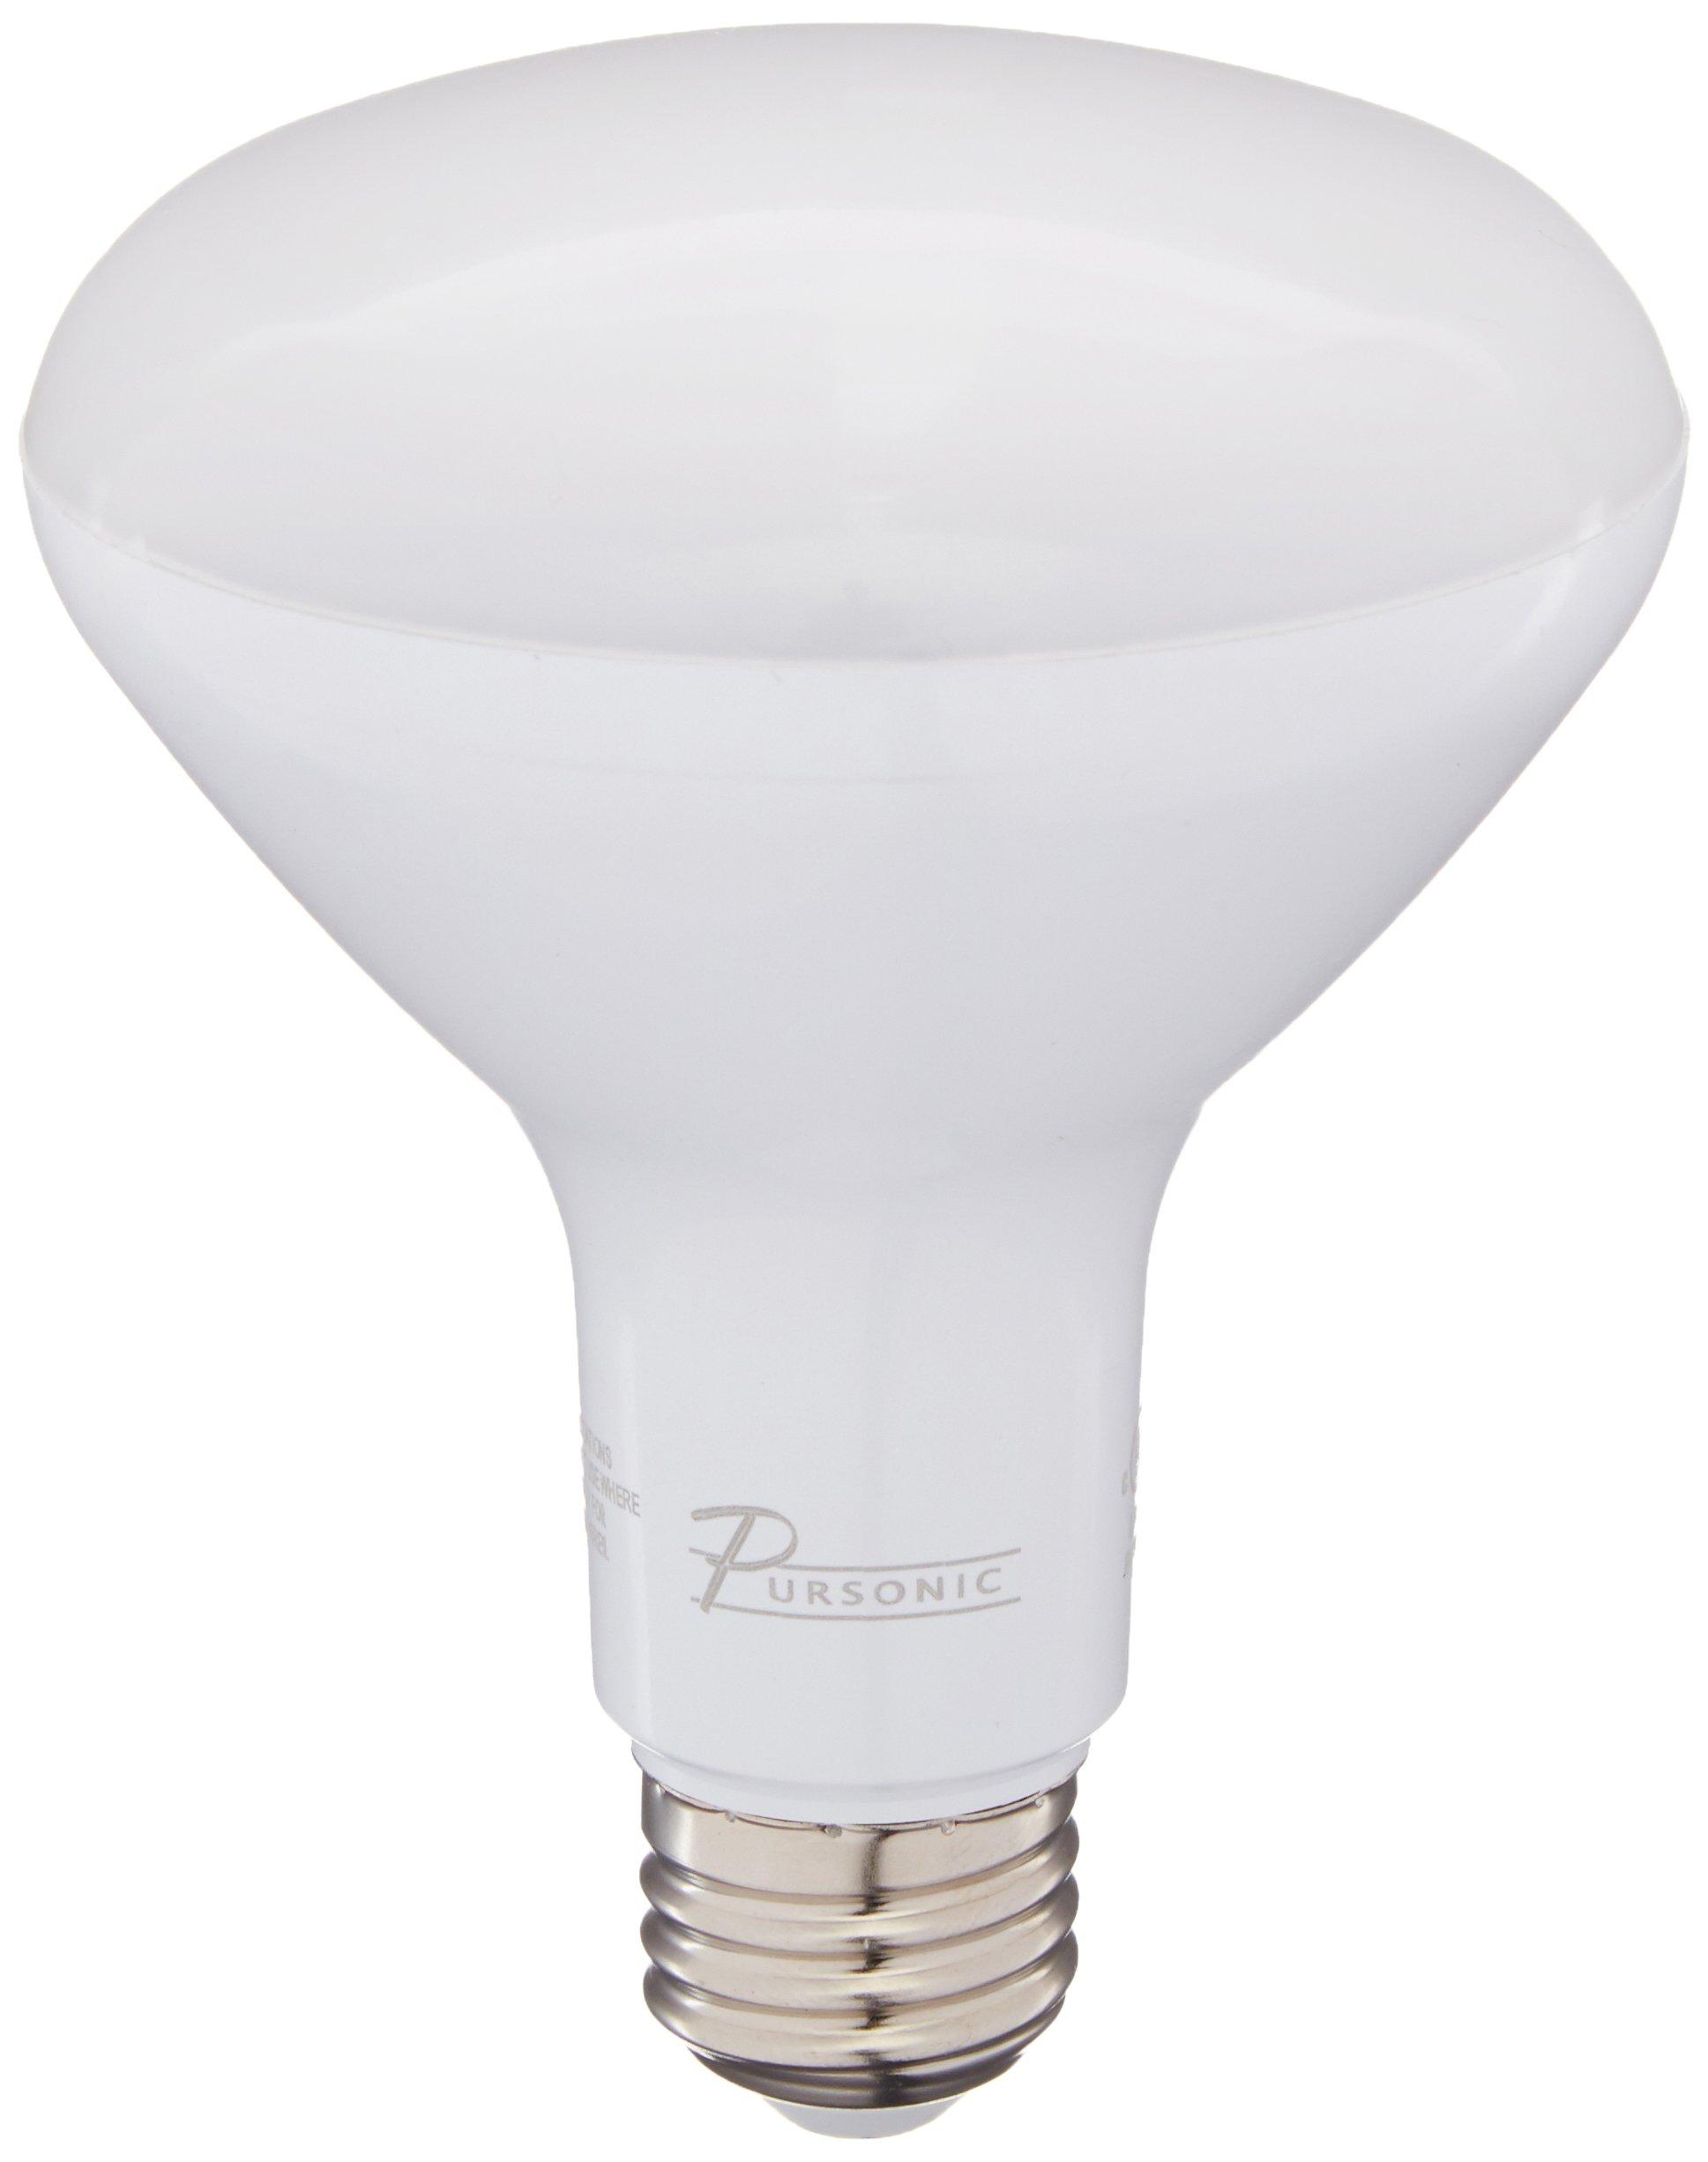 Pursonic DL 65 Watt Equivalent 10-Pack LED BR30 Light Bulbs, Non-Dimmable Daylight(5000K) BR30-10SP1DL